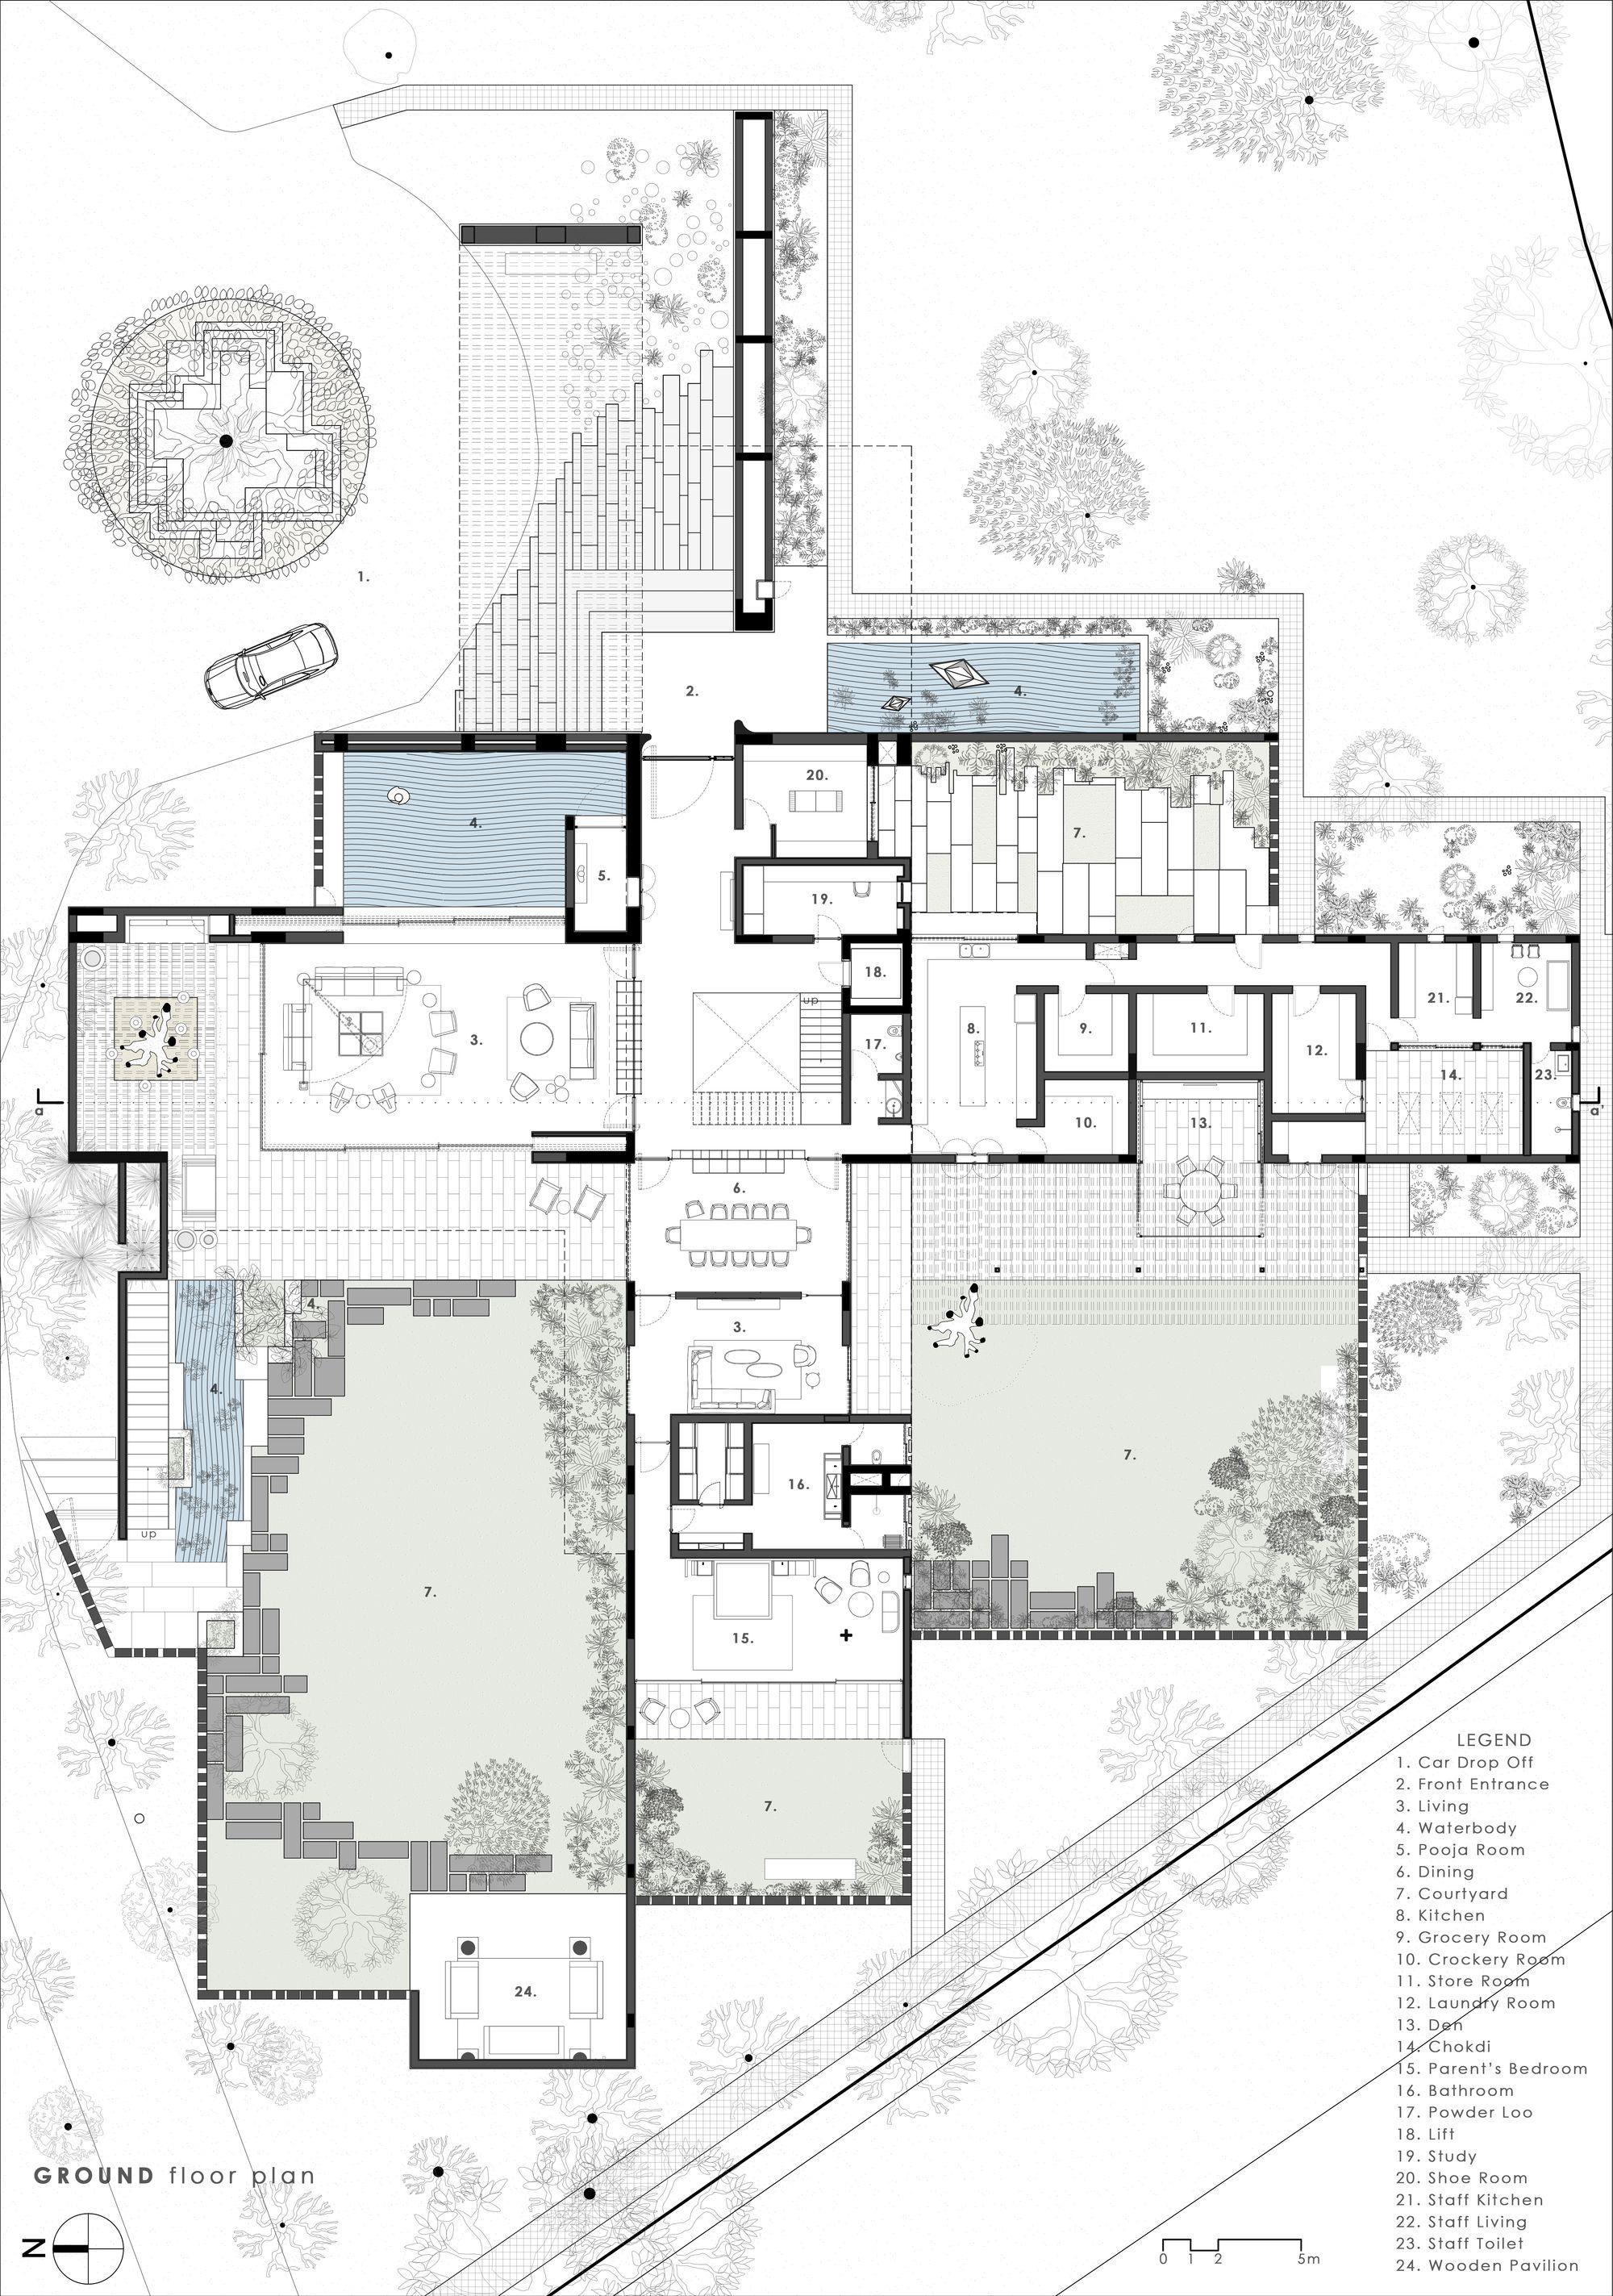 Gallery Of The House Of Secret Gardens Spasm Design 38 Architectural Floor Plans Floor Plan Design Home Design Floor Plans